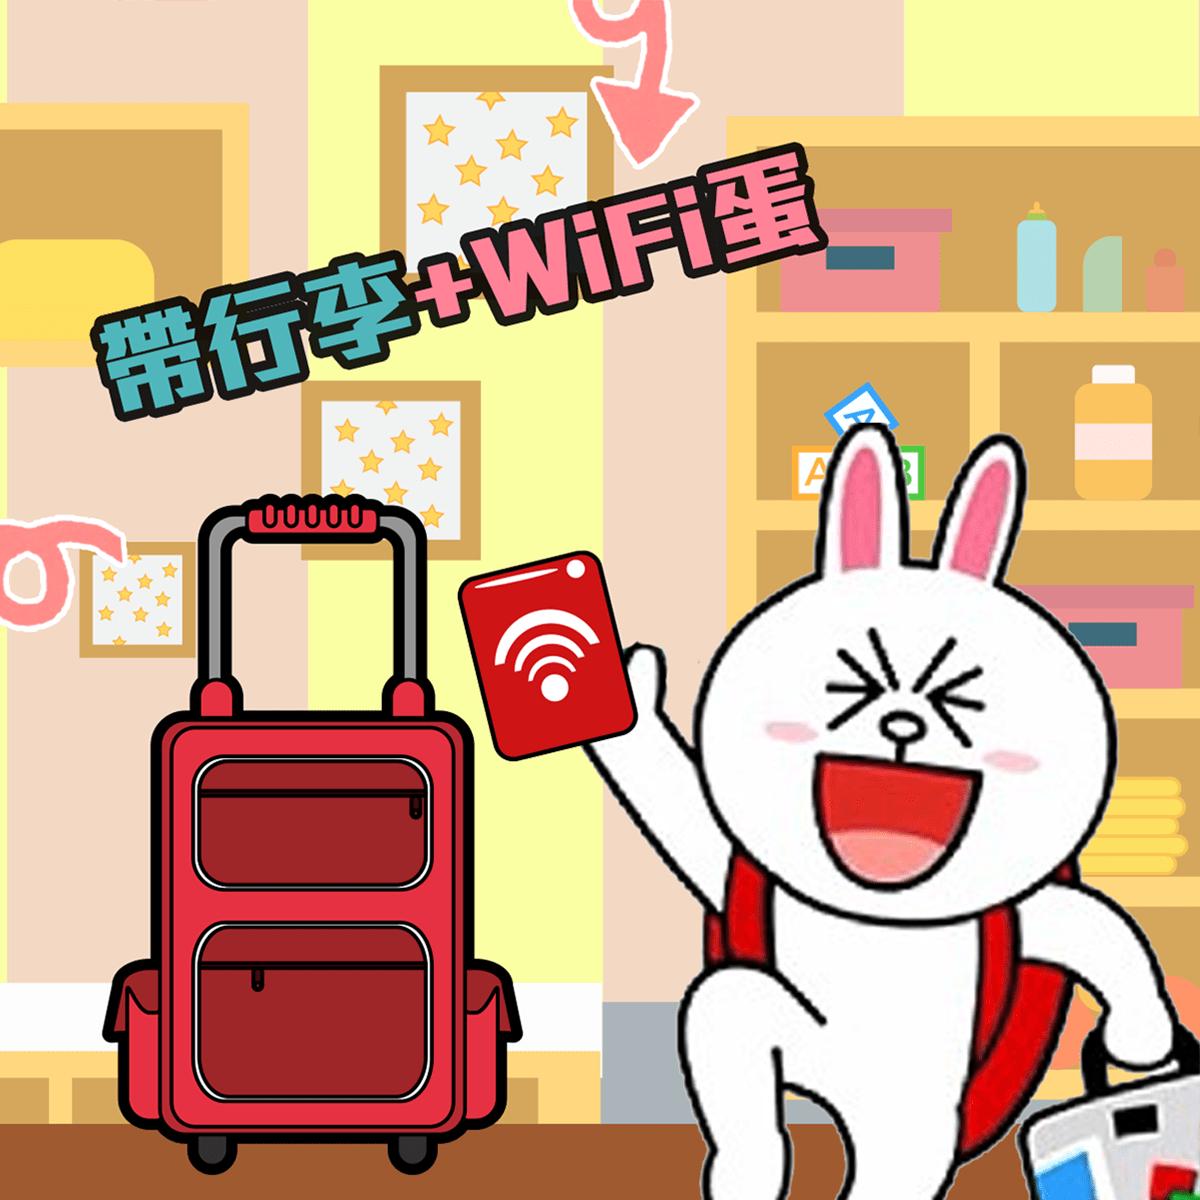 Image credit:  Uroaming WiFi - Hong Kong - 環球漫遊 陪您旅遊